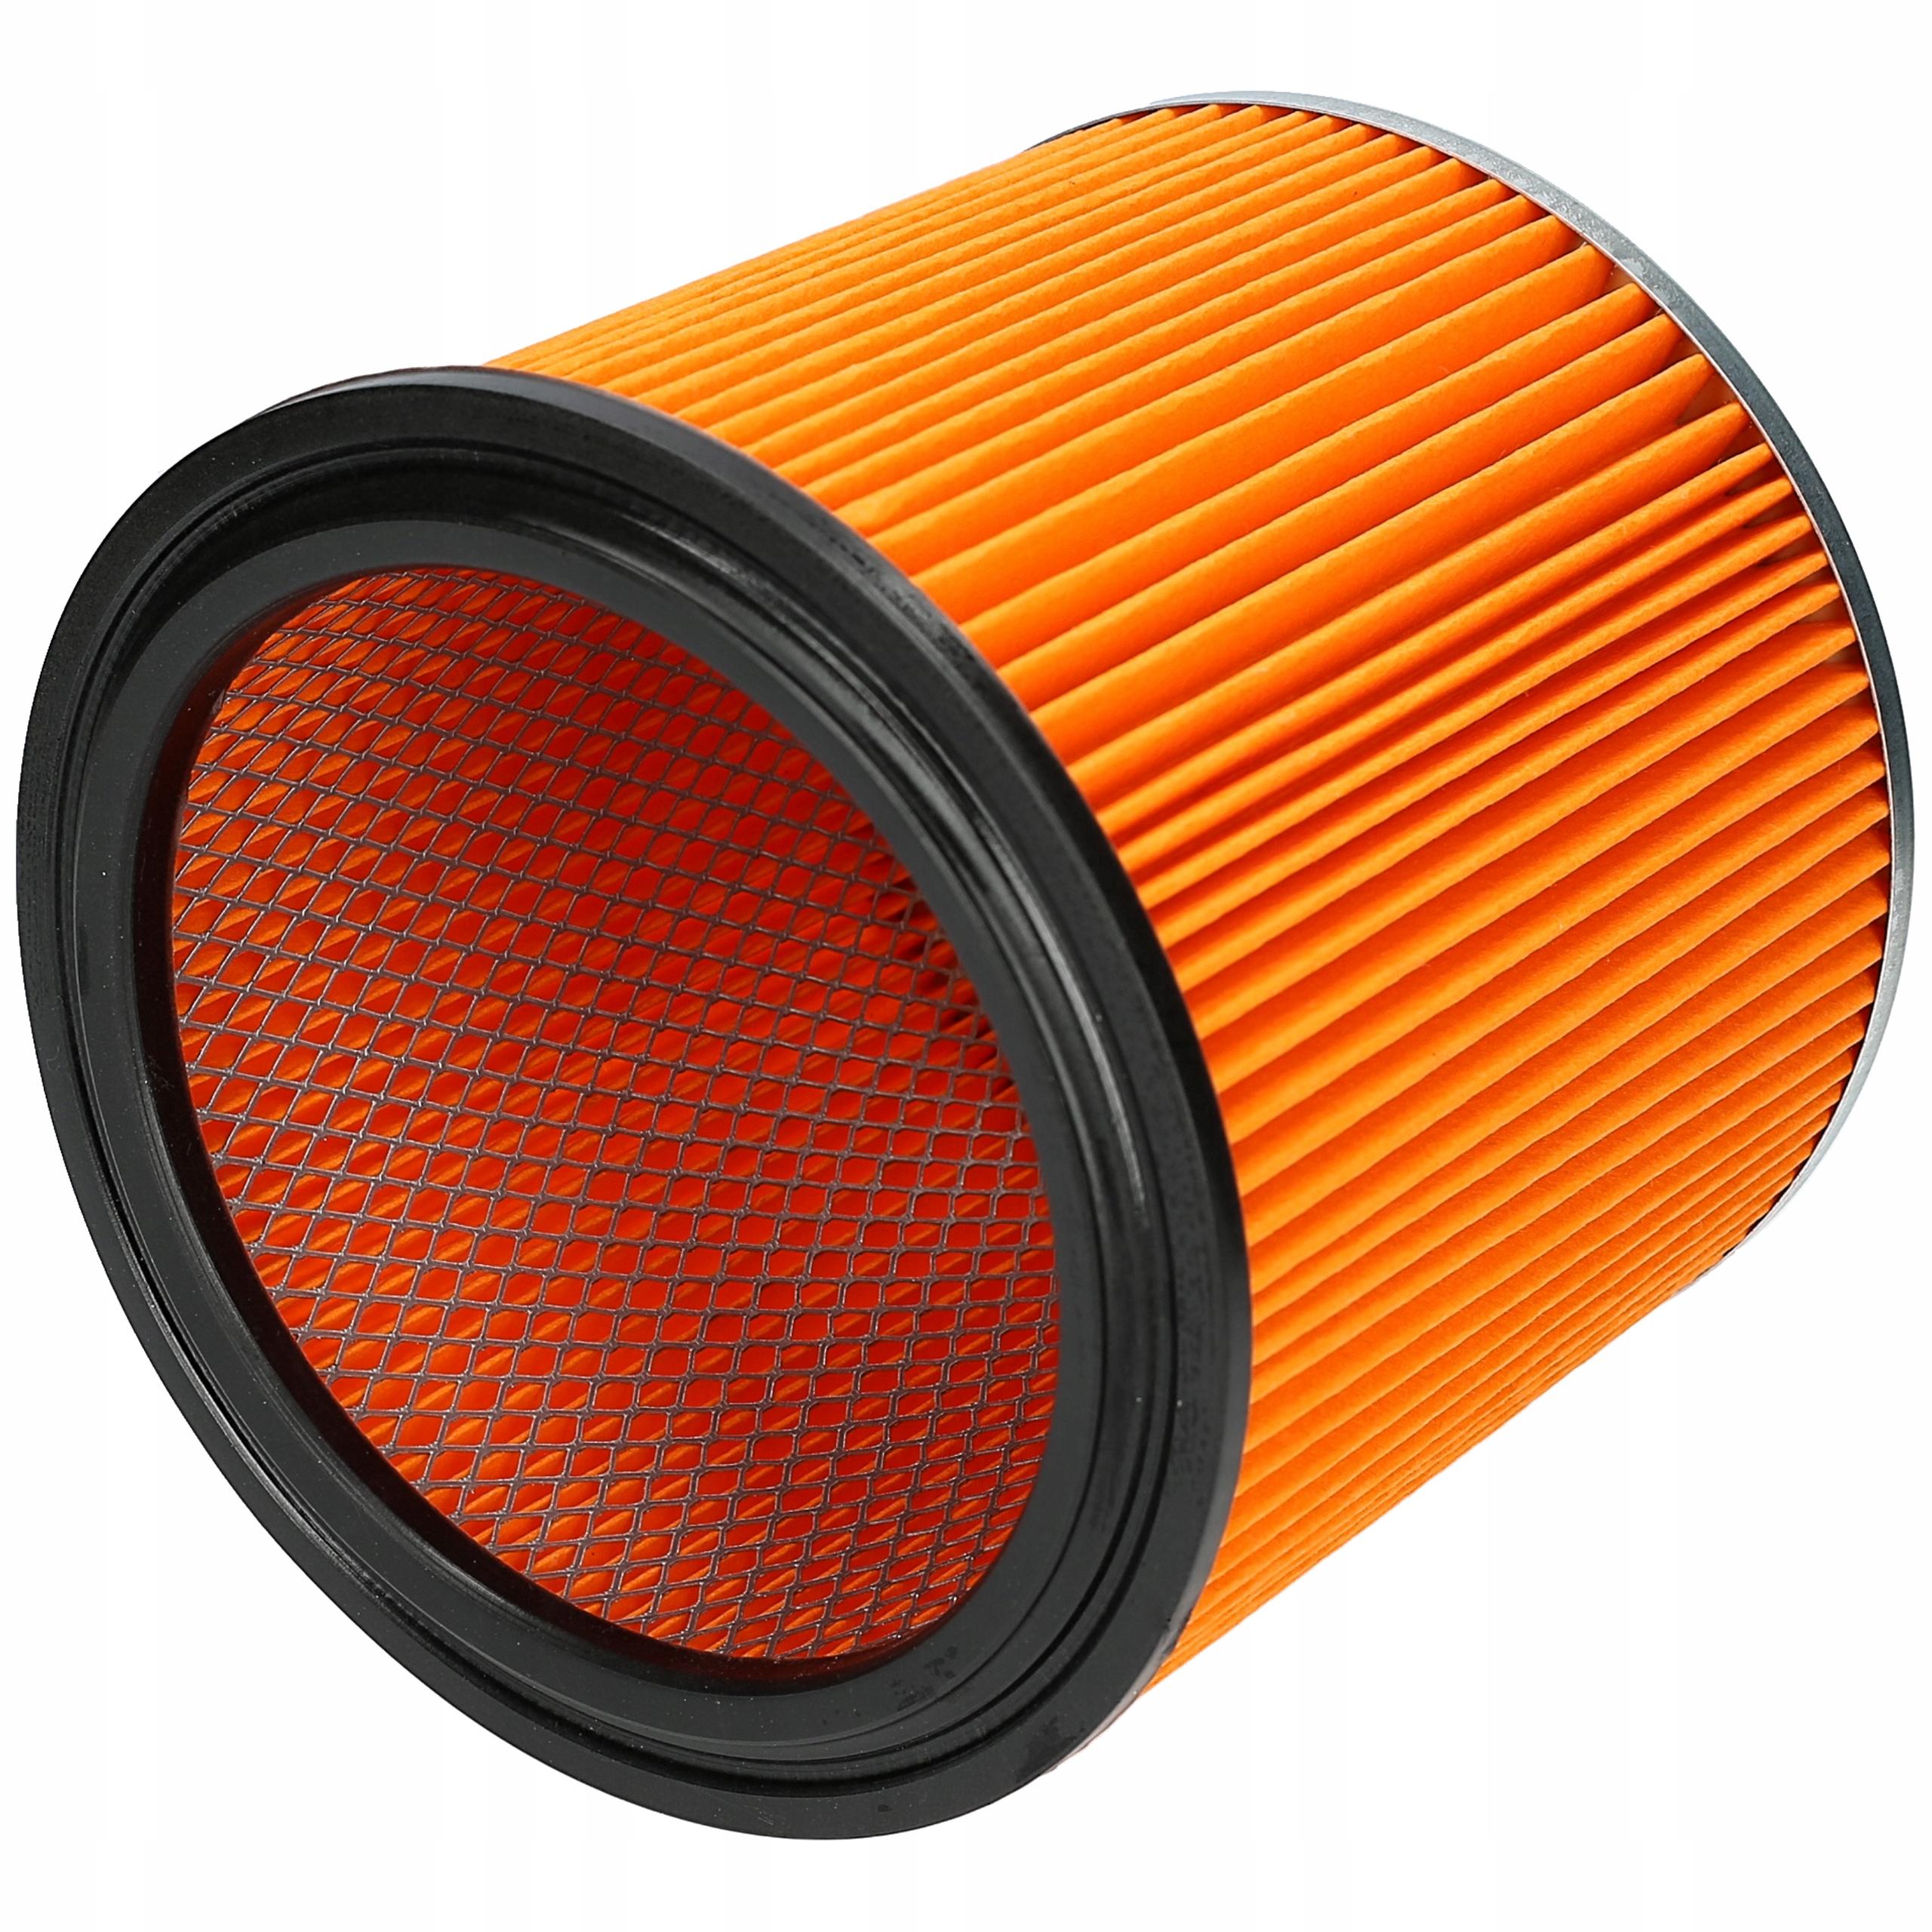 Vákuový filter Thomas POWER PACK 1620 C